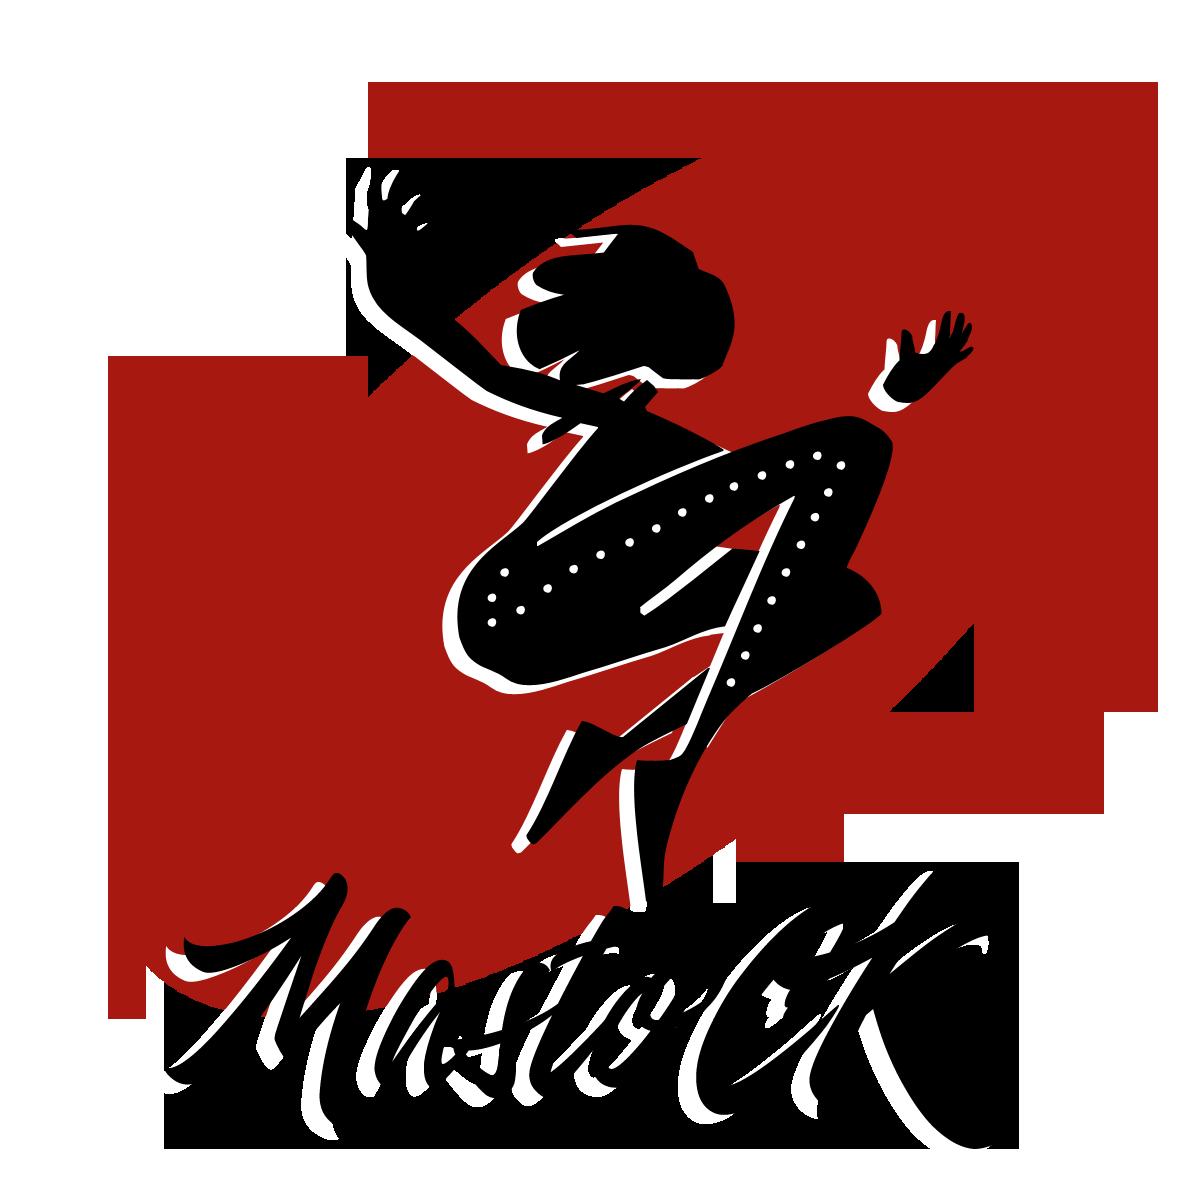 Cie Mastock